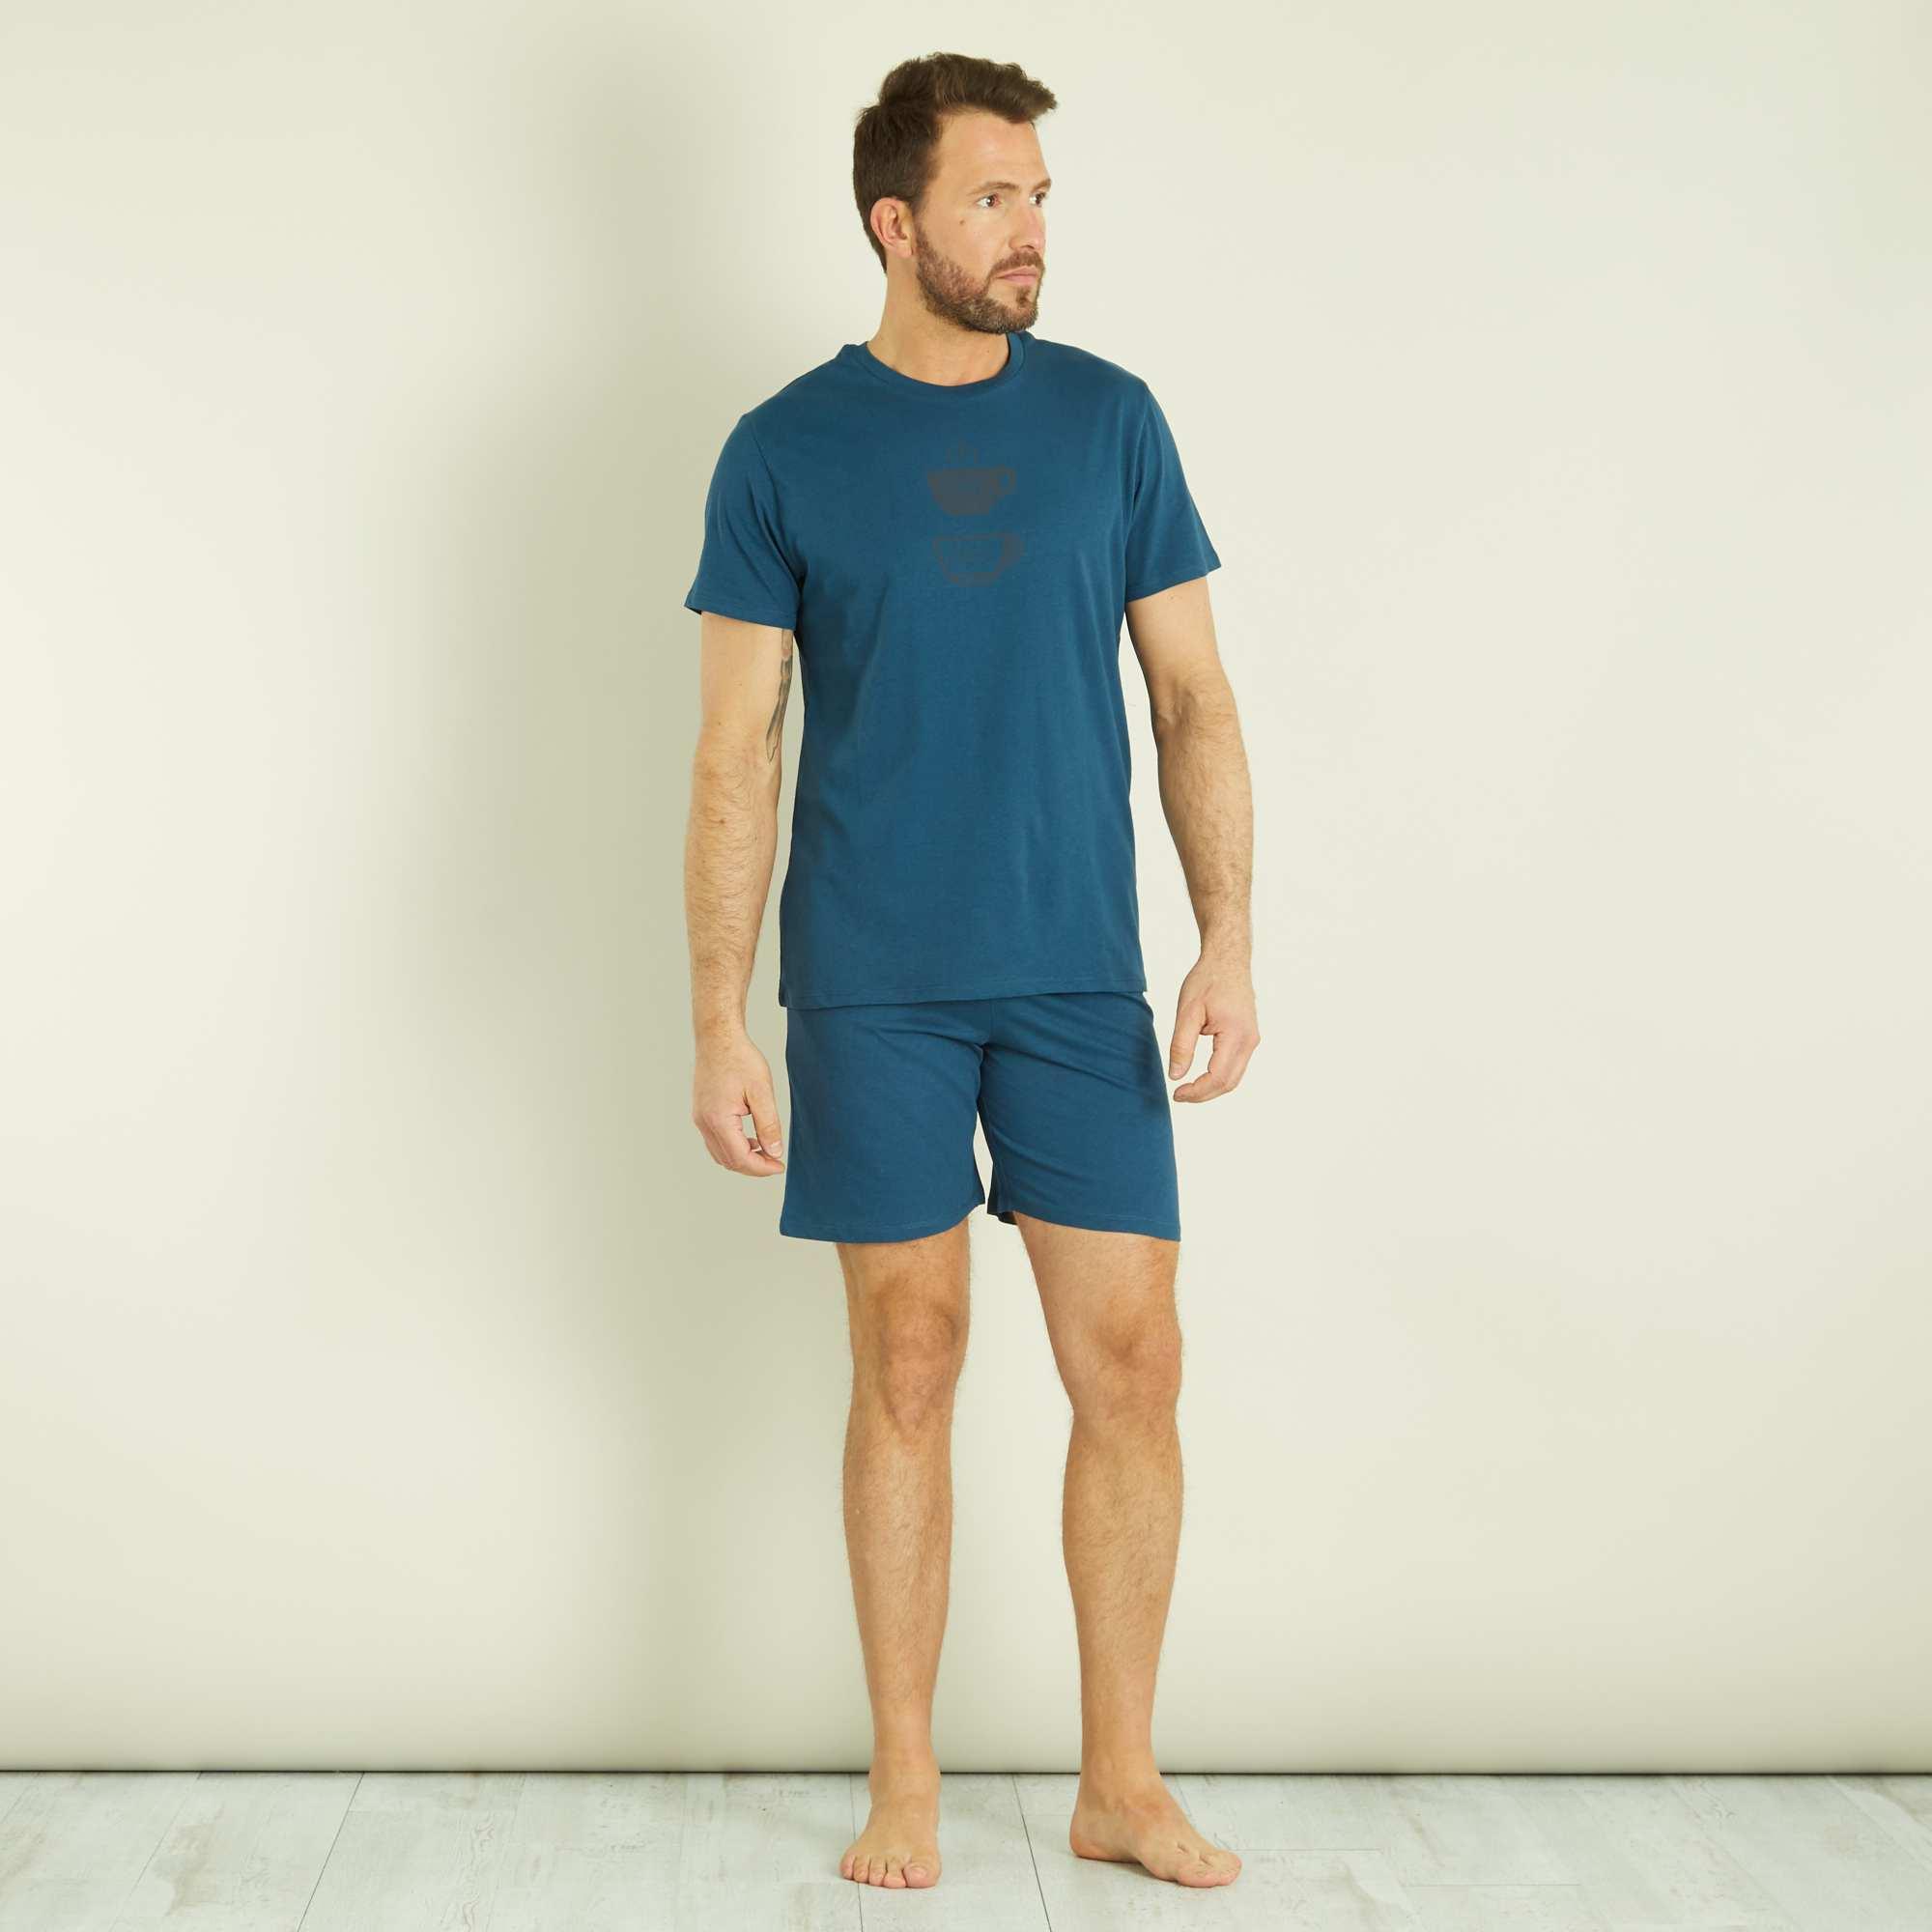 pyjama short en coton homme bleu canard kiabi 7 00. Black Bedroom Furniture Sets. Home Design Ideas